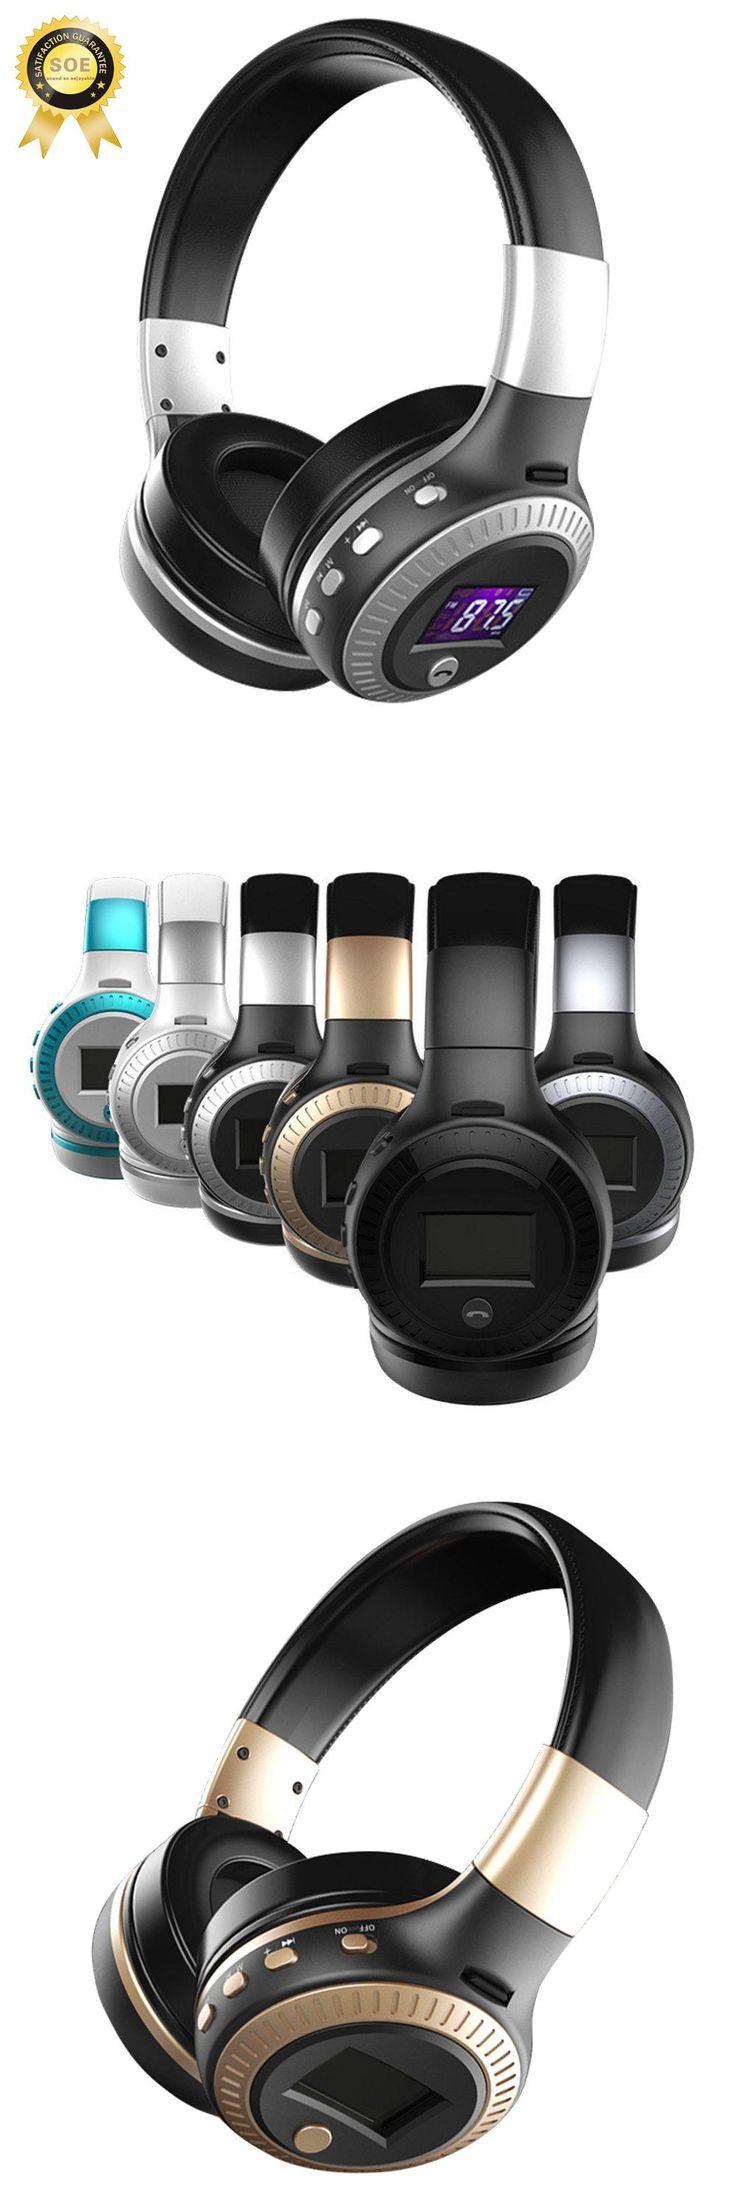 LCD display headphones bluetooth cordless headphones for computer bluetooth headphone with microphone hifi airpods stereo music